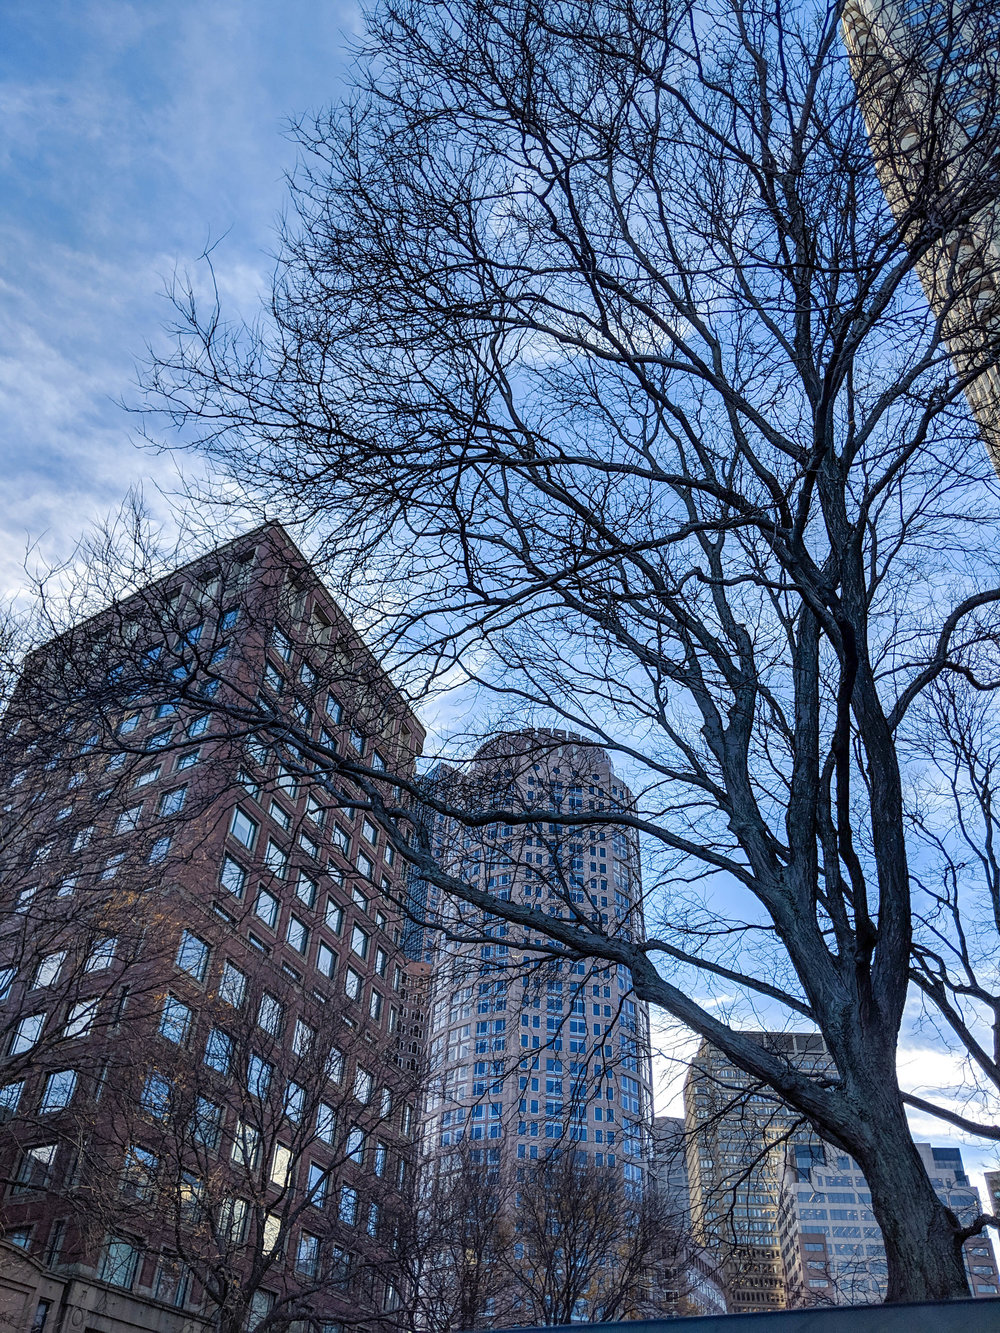 bri rinehart; photography; boston; nature; architecture; buildings